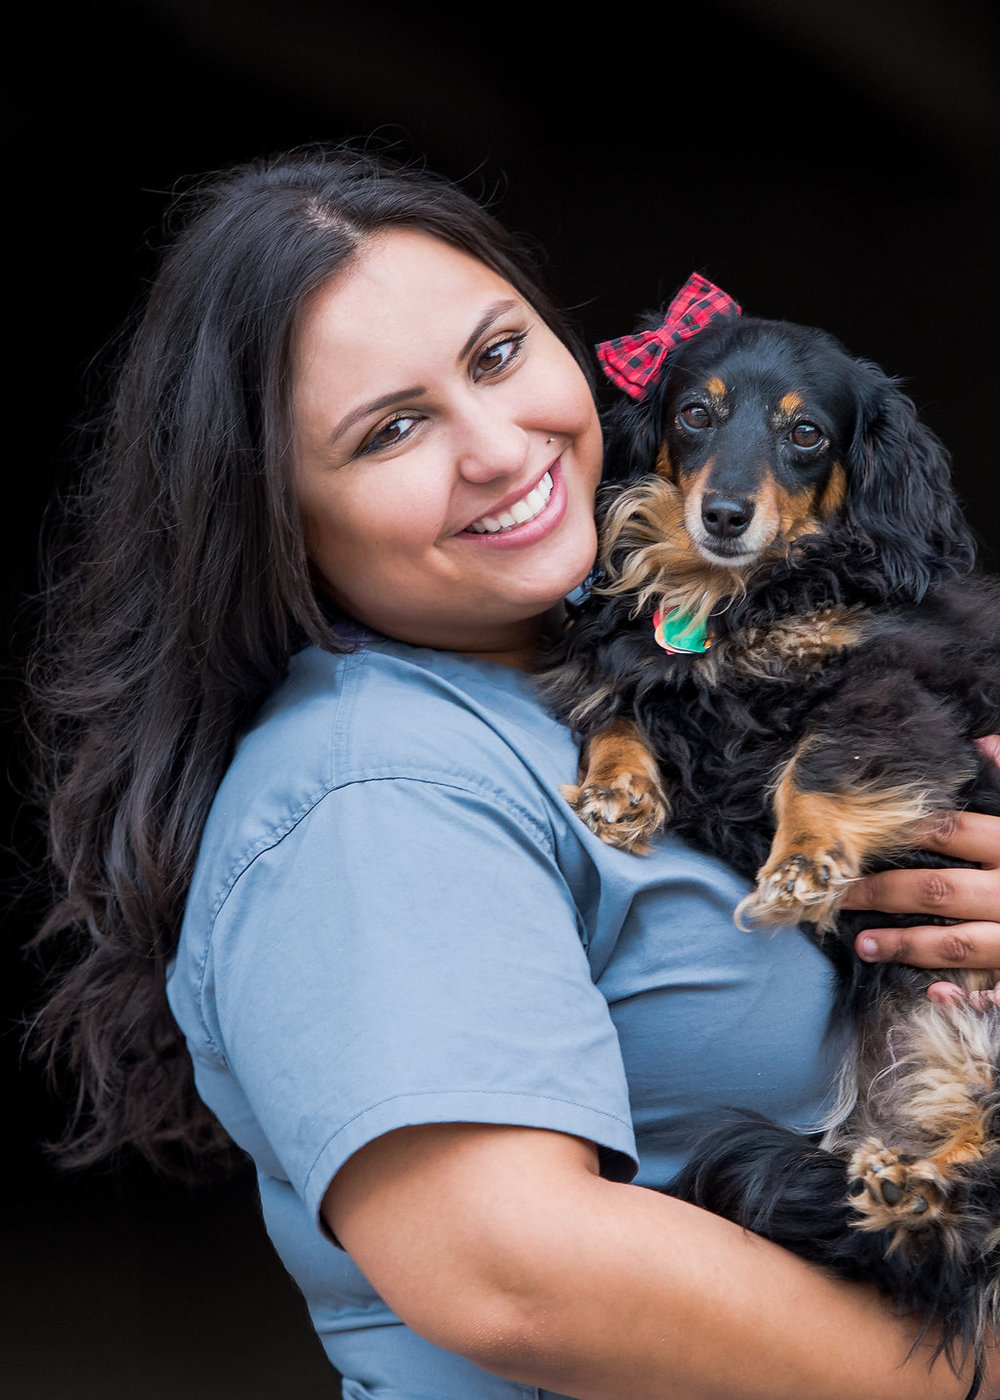 Lis, RVT Certified Veterinary Technician